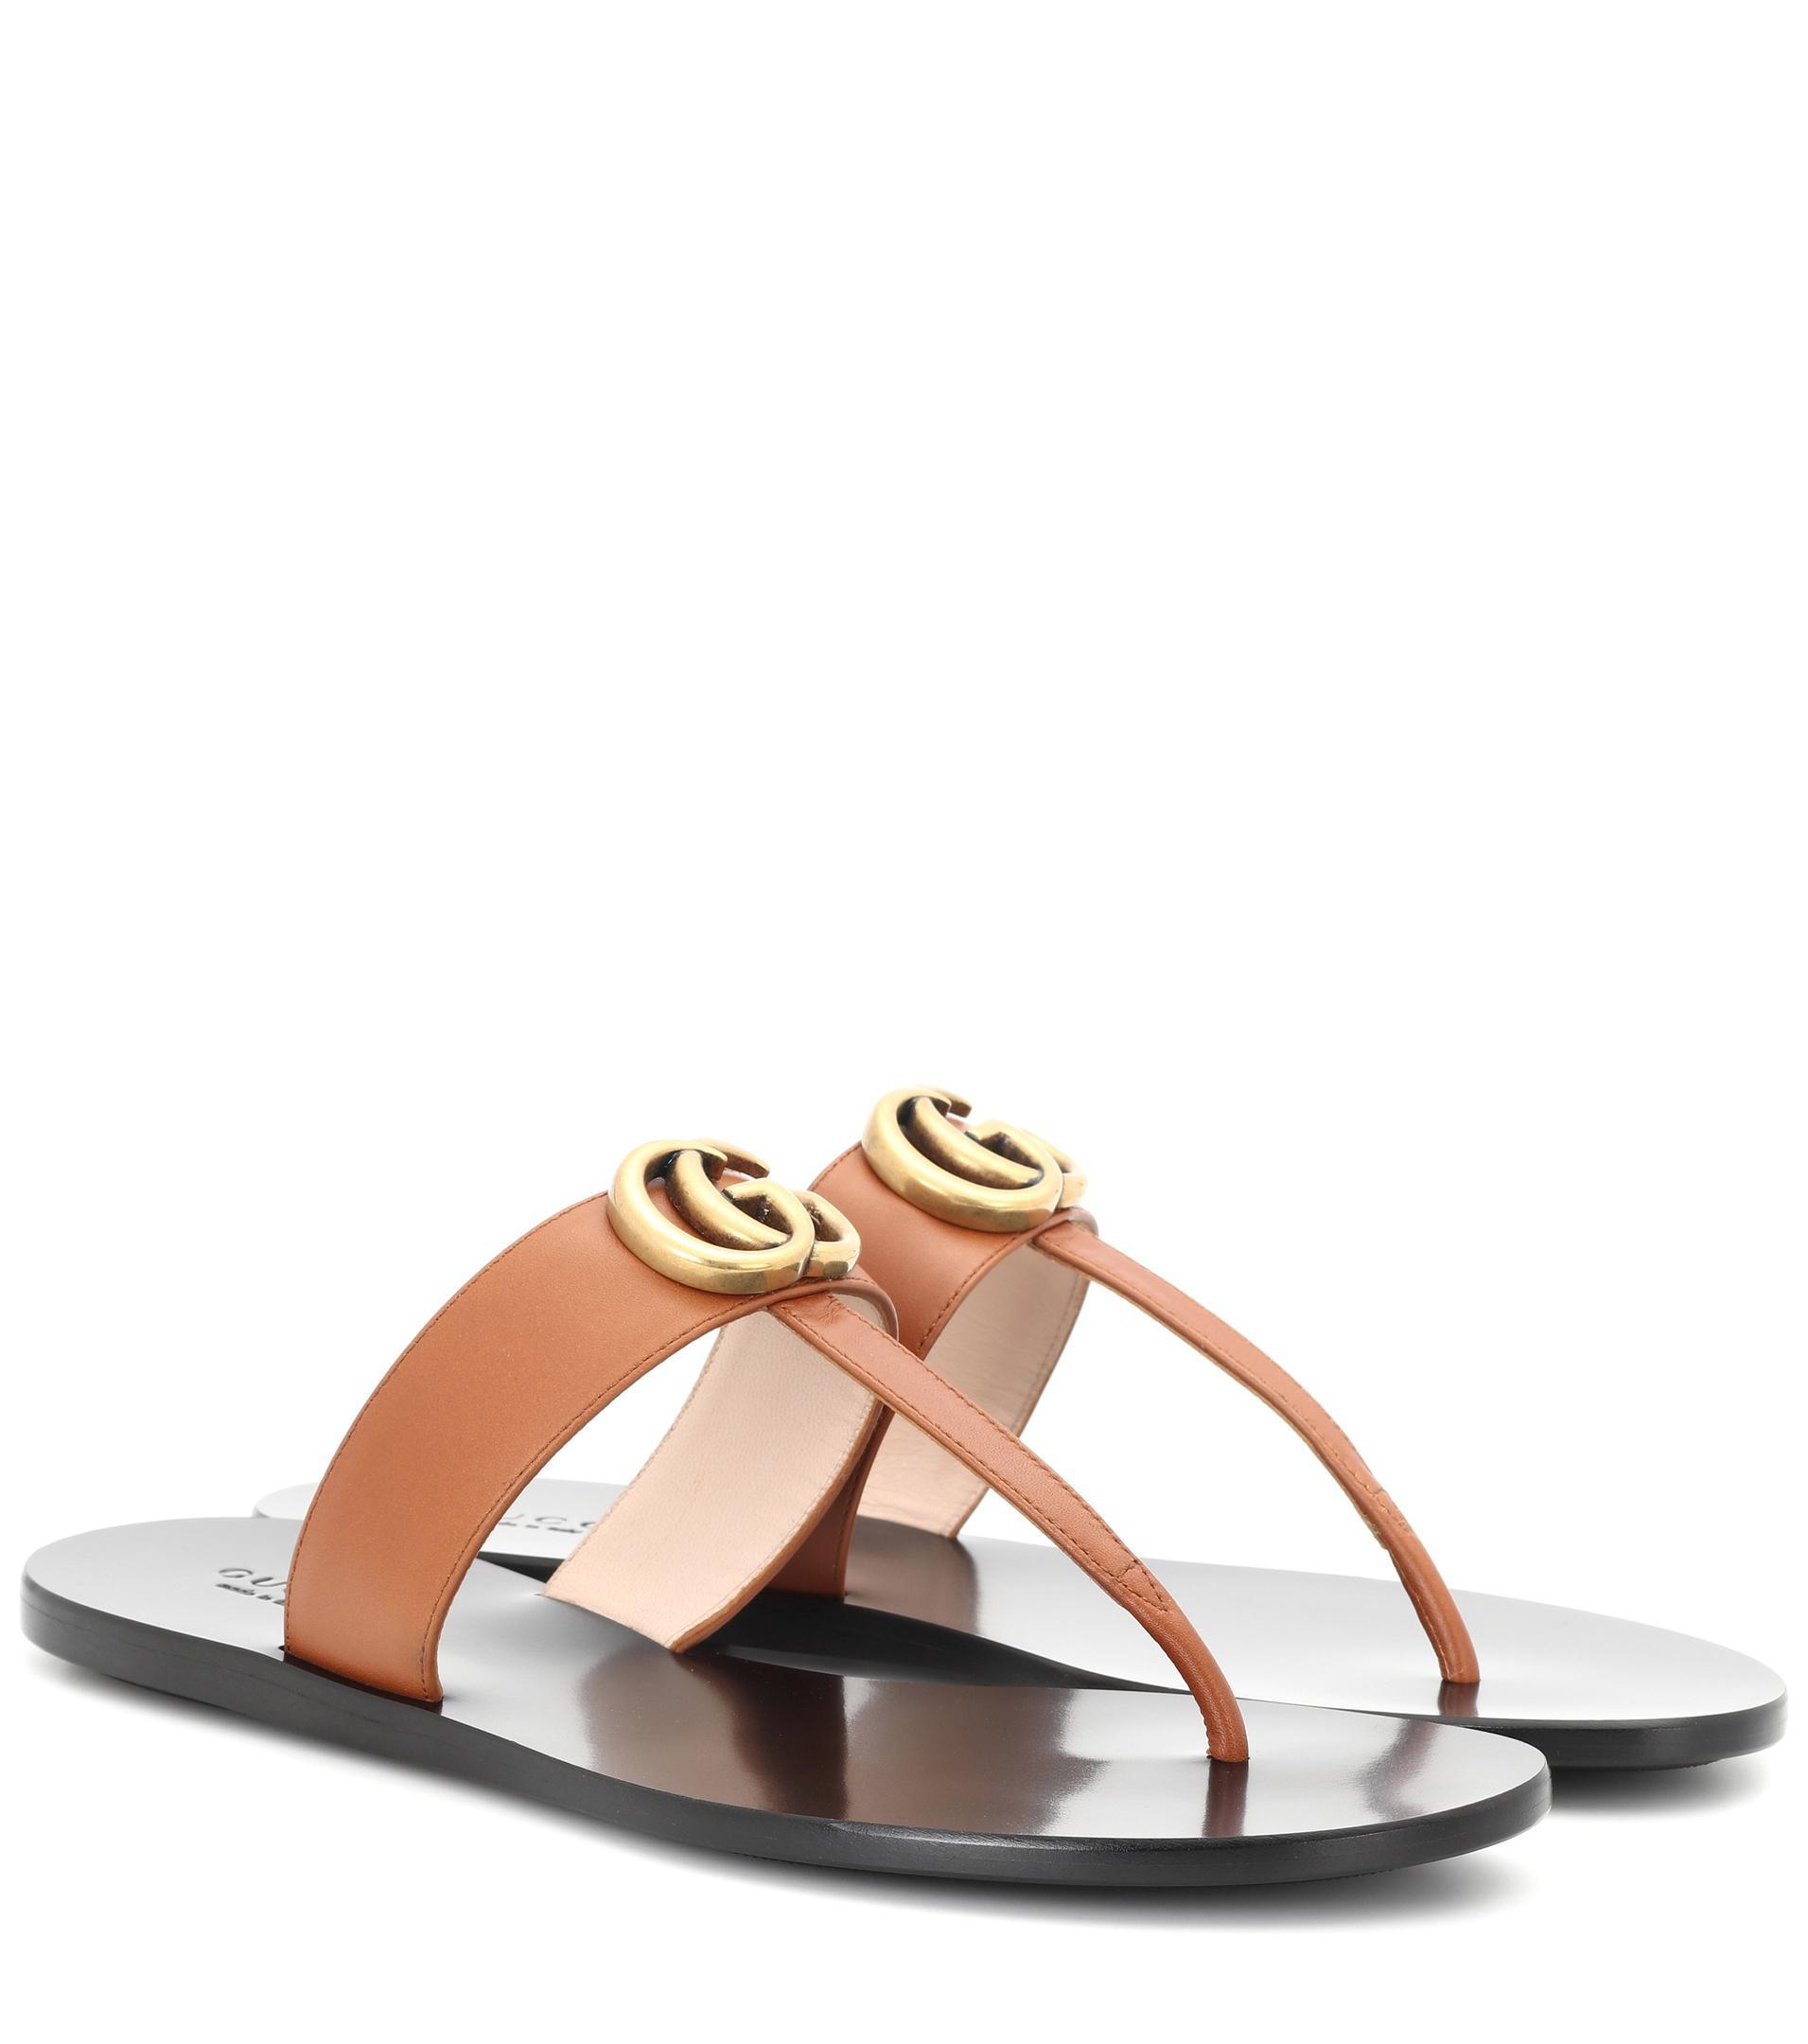 d364257fb8e0 Lyst - Gucci Sandalen aus Leder in Braun